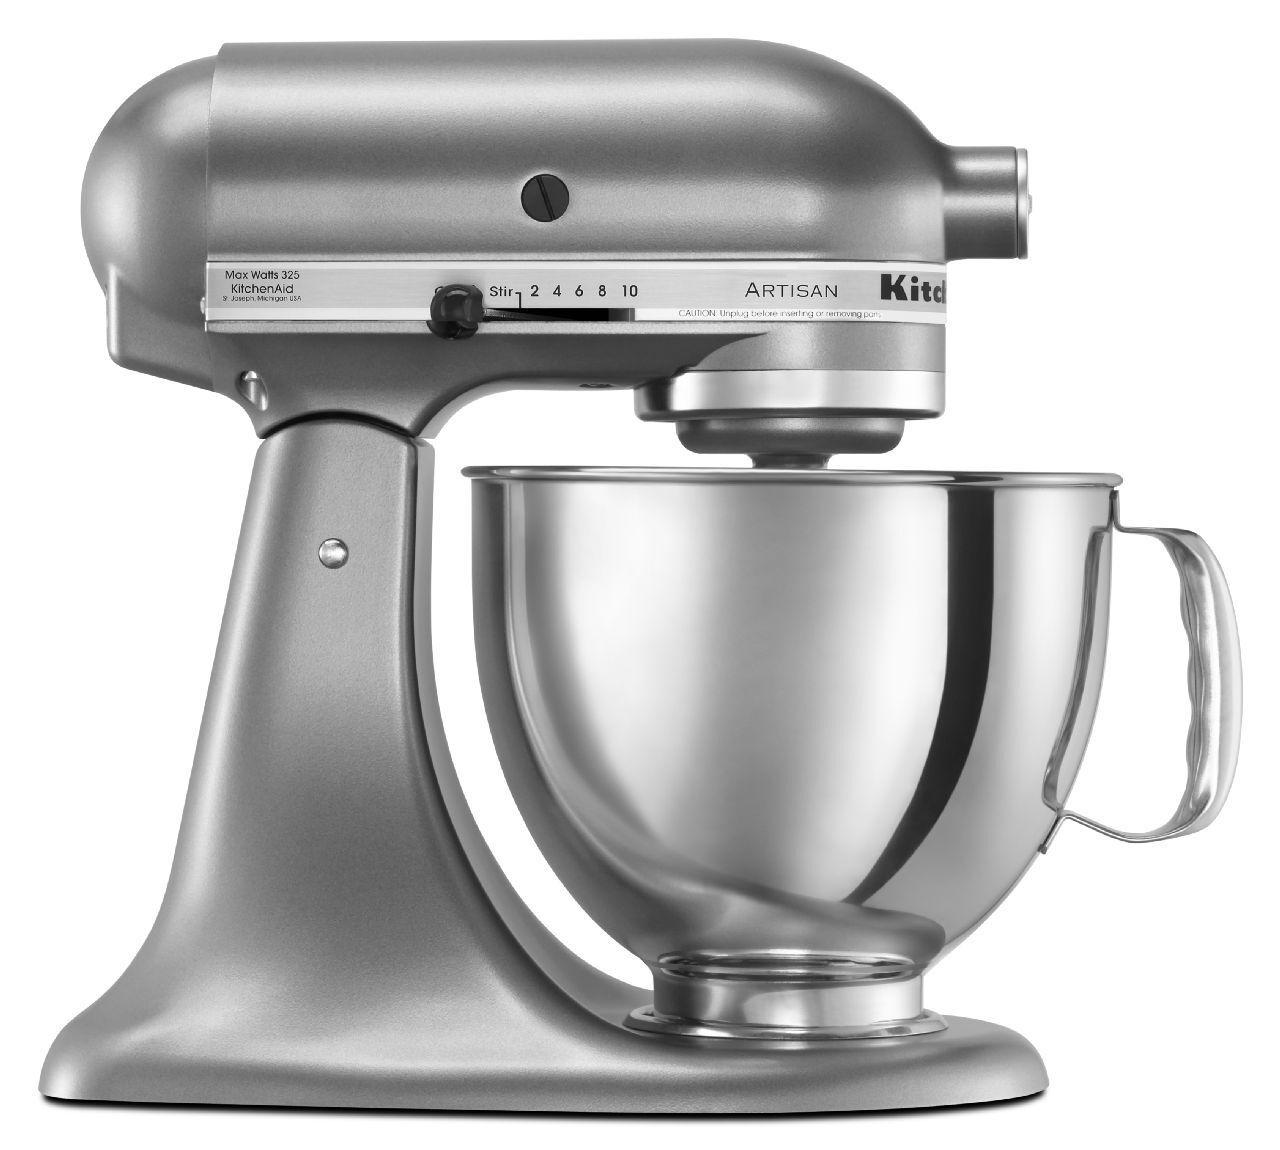 KitchenAid Stand Mixer tilt 5-QT rrk150 Ksm150ps Artisan Tilt Many Colors Choose